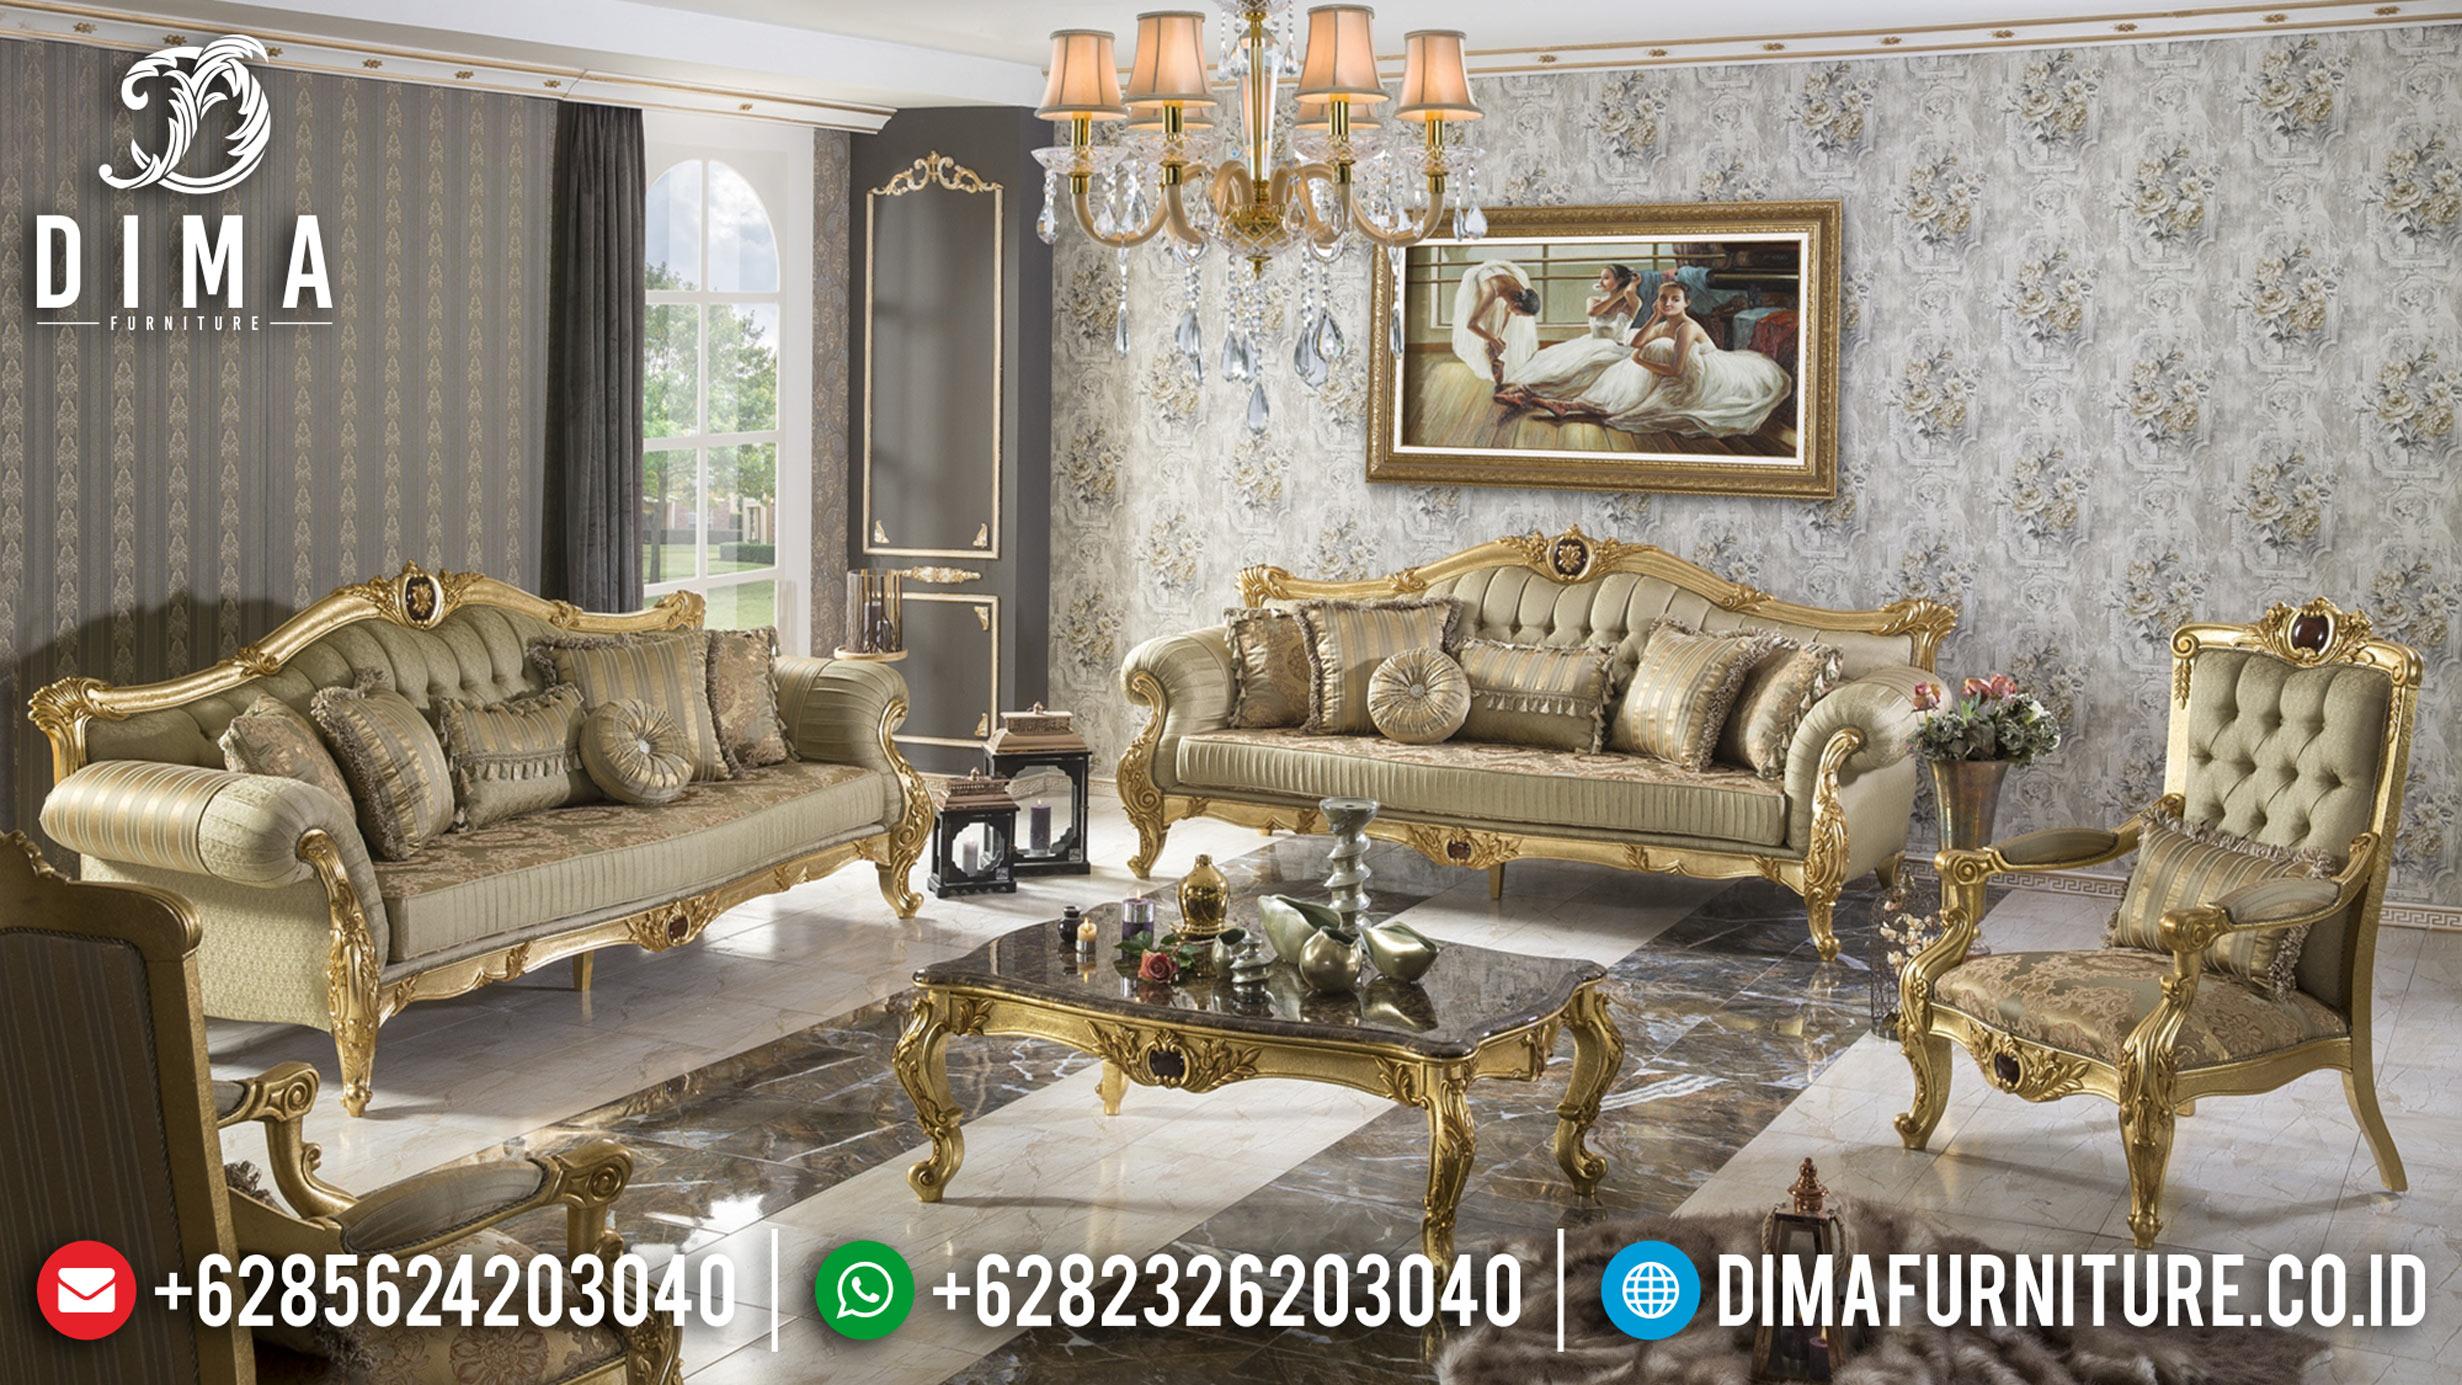 Set Sofa Tamu Jepara Mewah Finishing Gold Leaf Model Ukiran Terbaru MMJ-0041